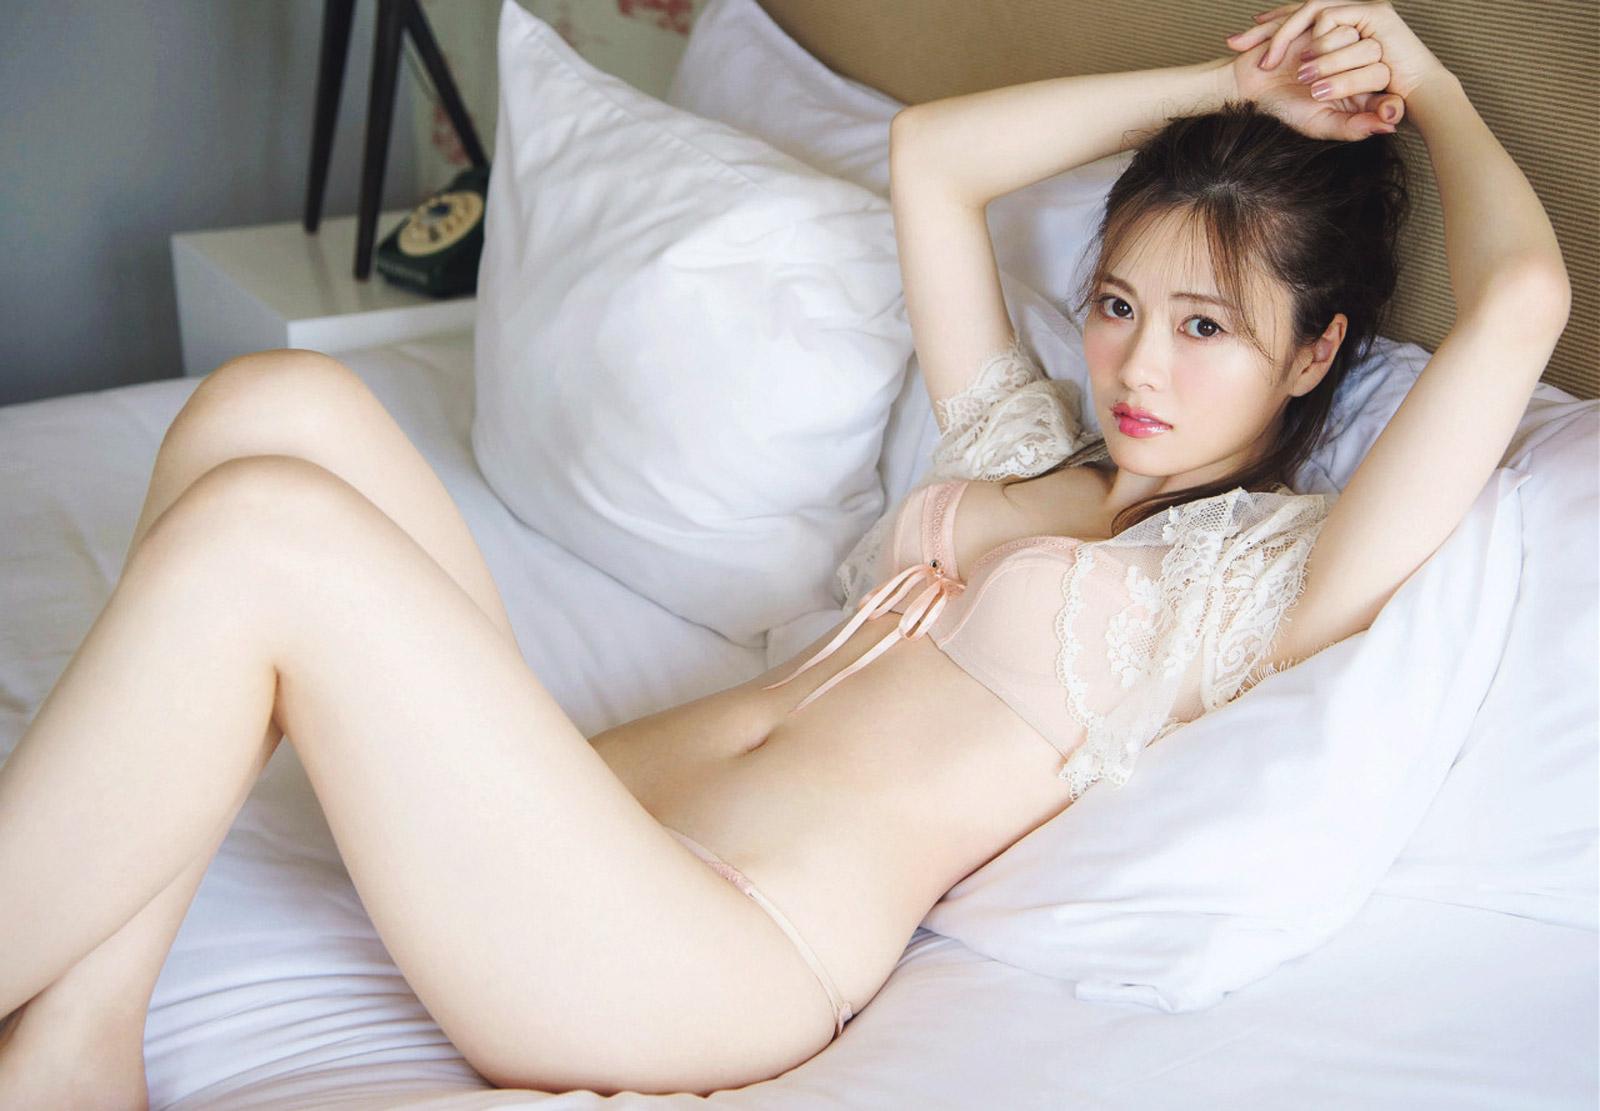 乃木坂46・白石麻衣 写真集『パスポート』